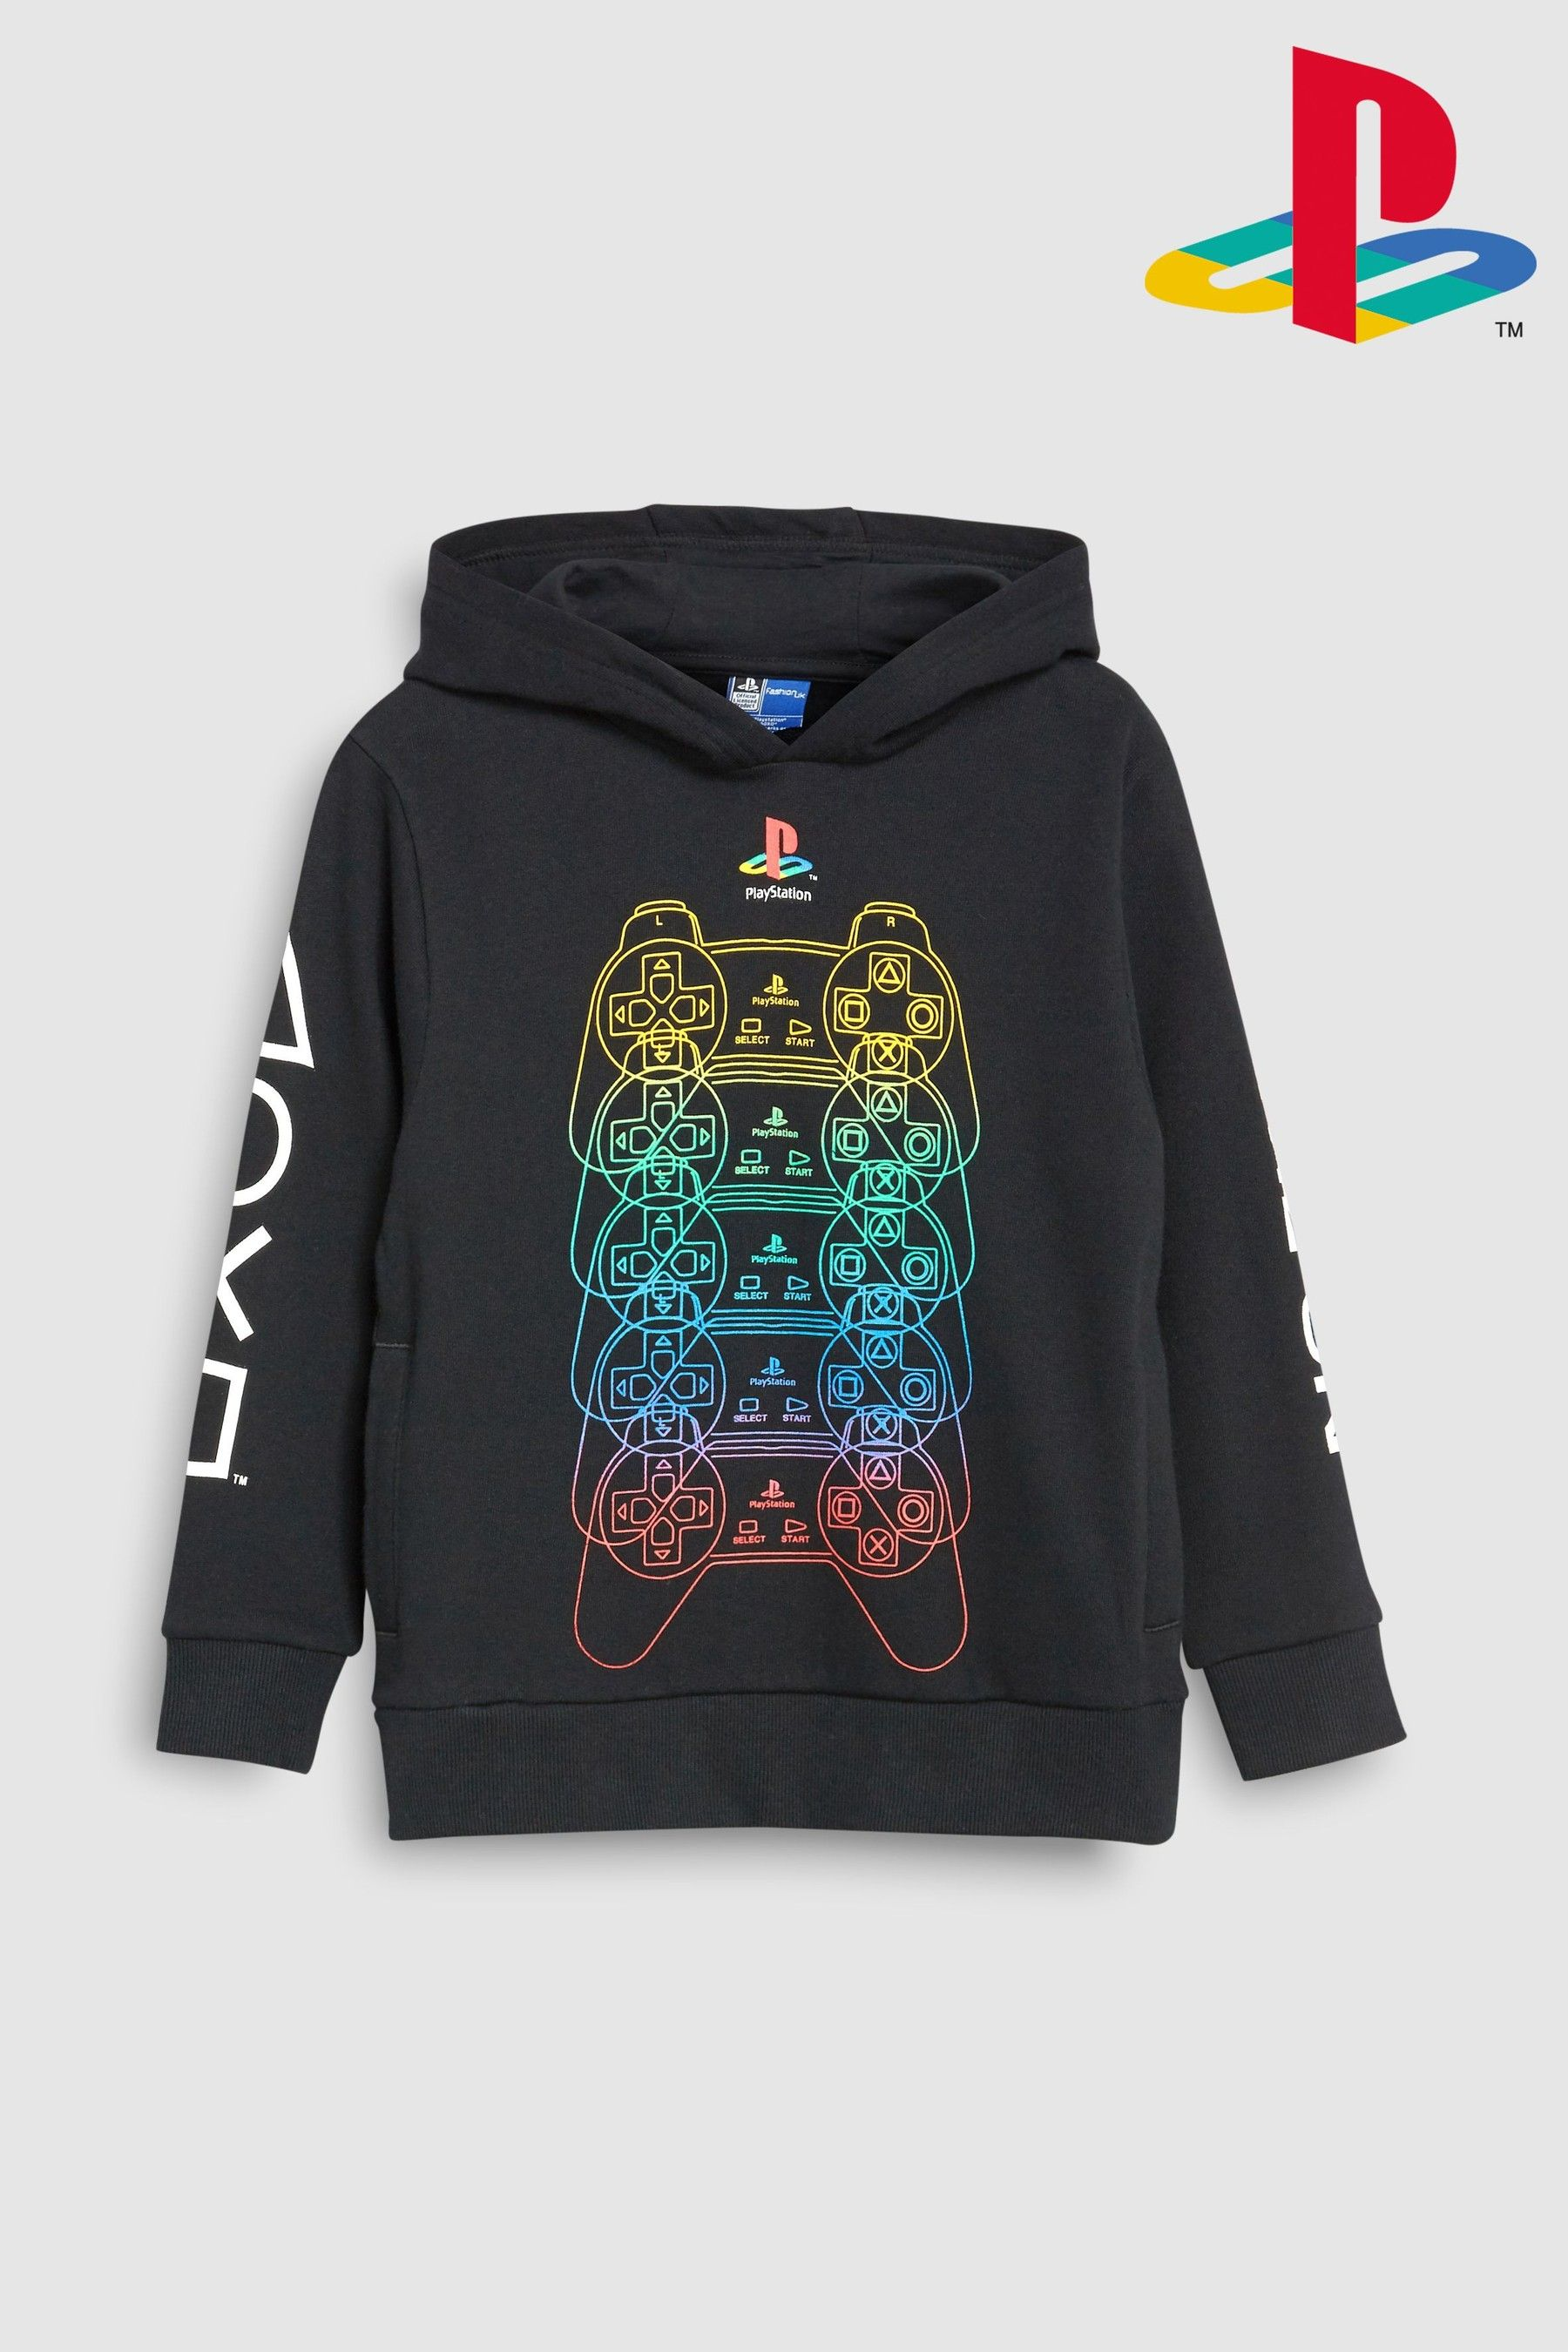 Boy's Hoodies & Sweatshirts | Clothing | 6pm